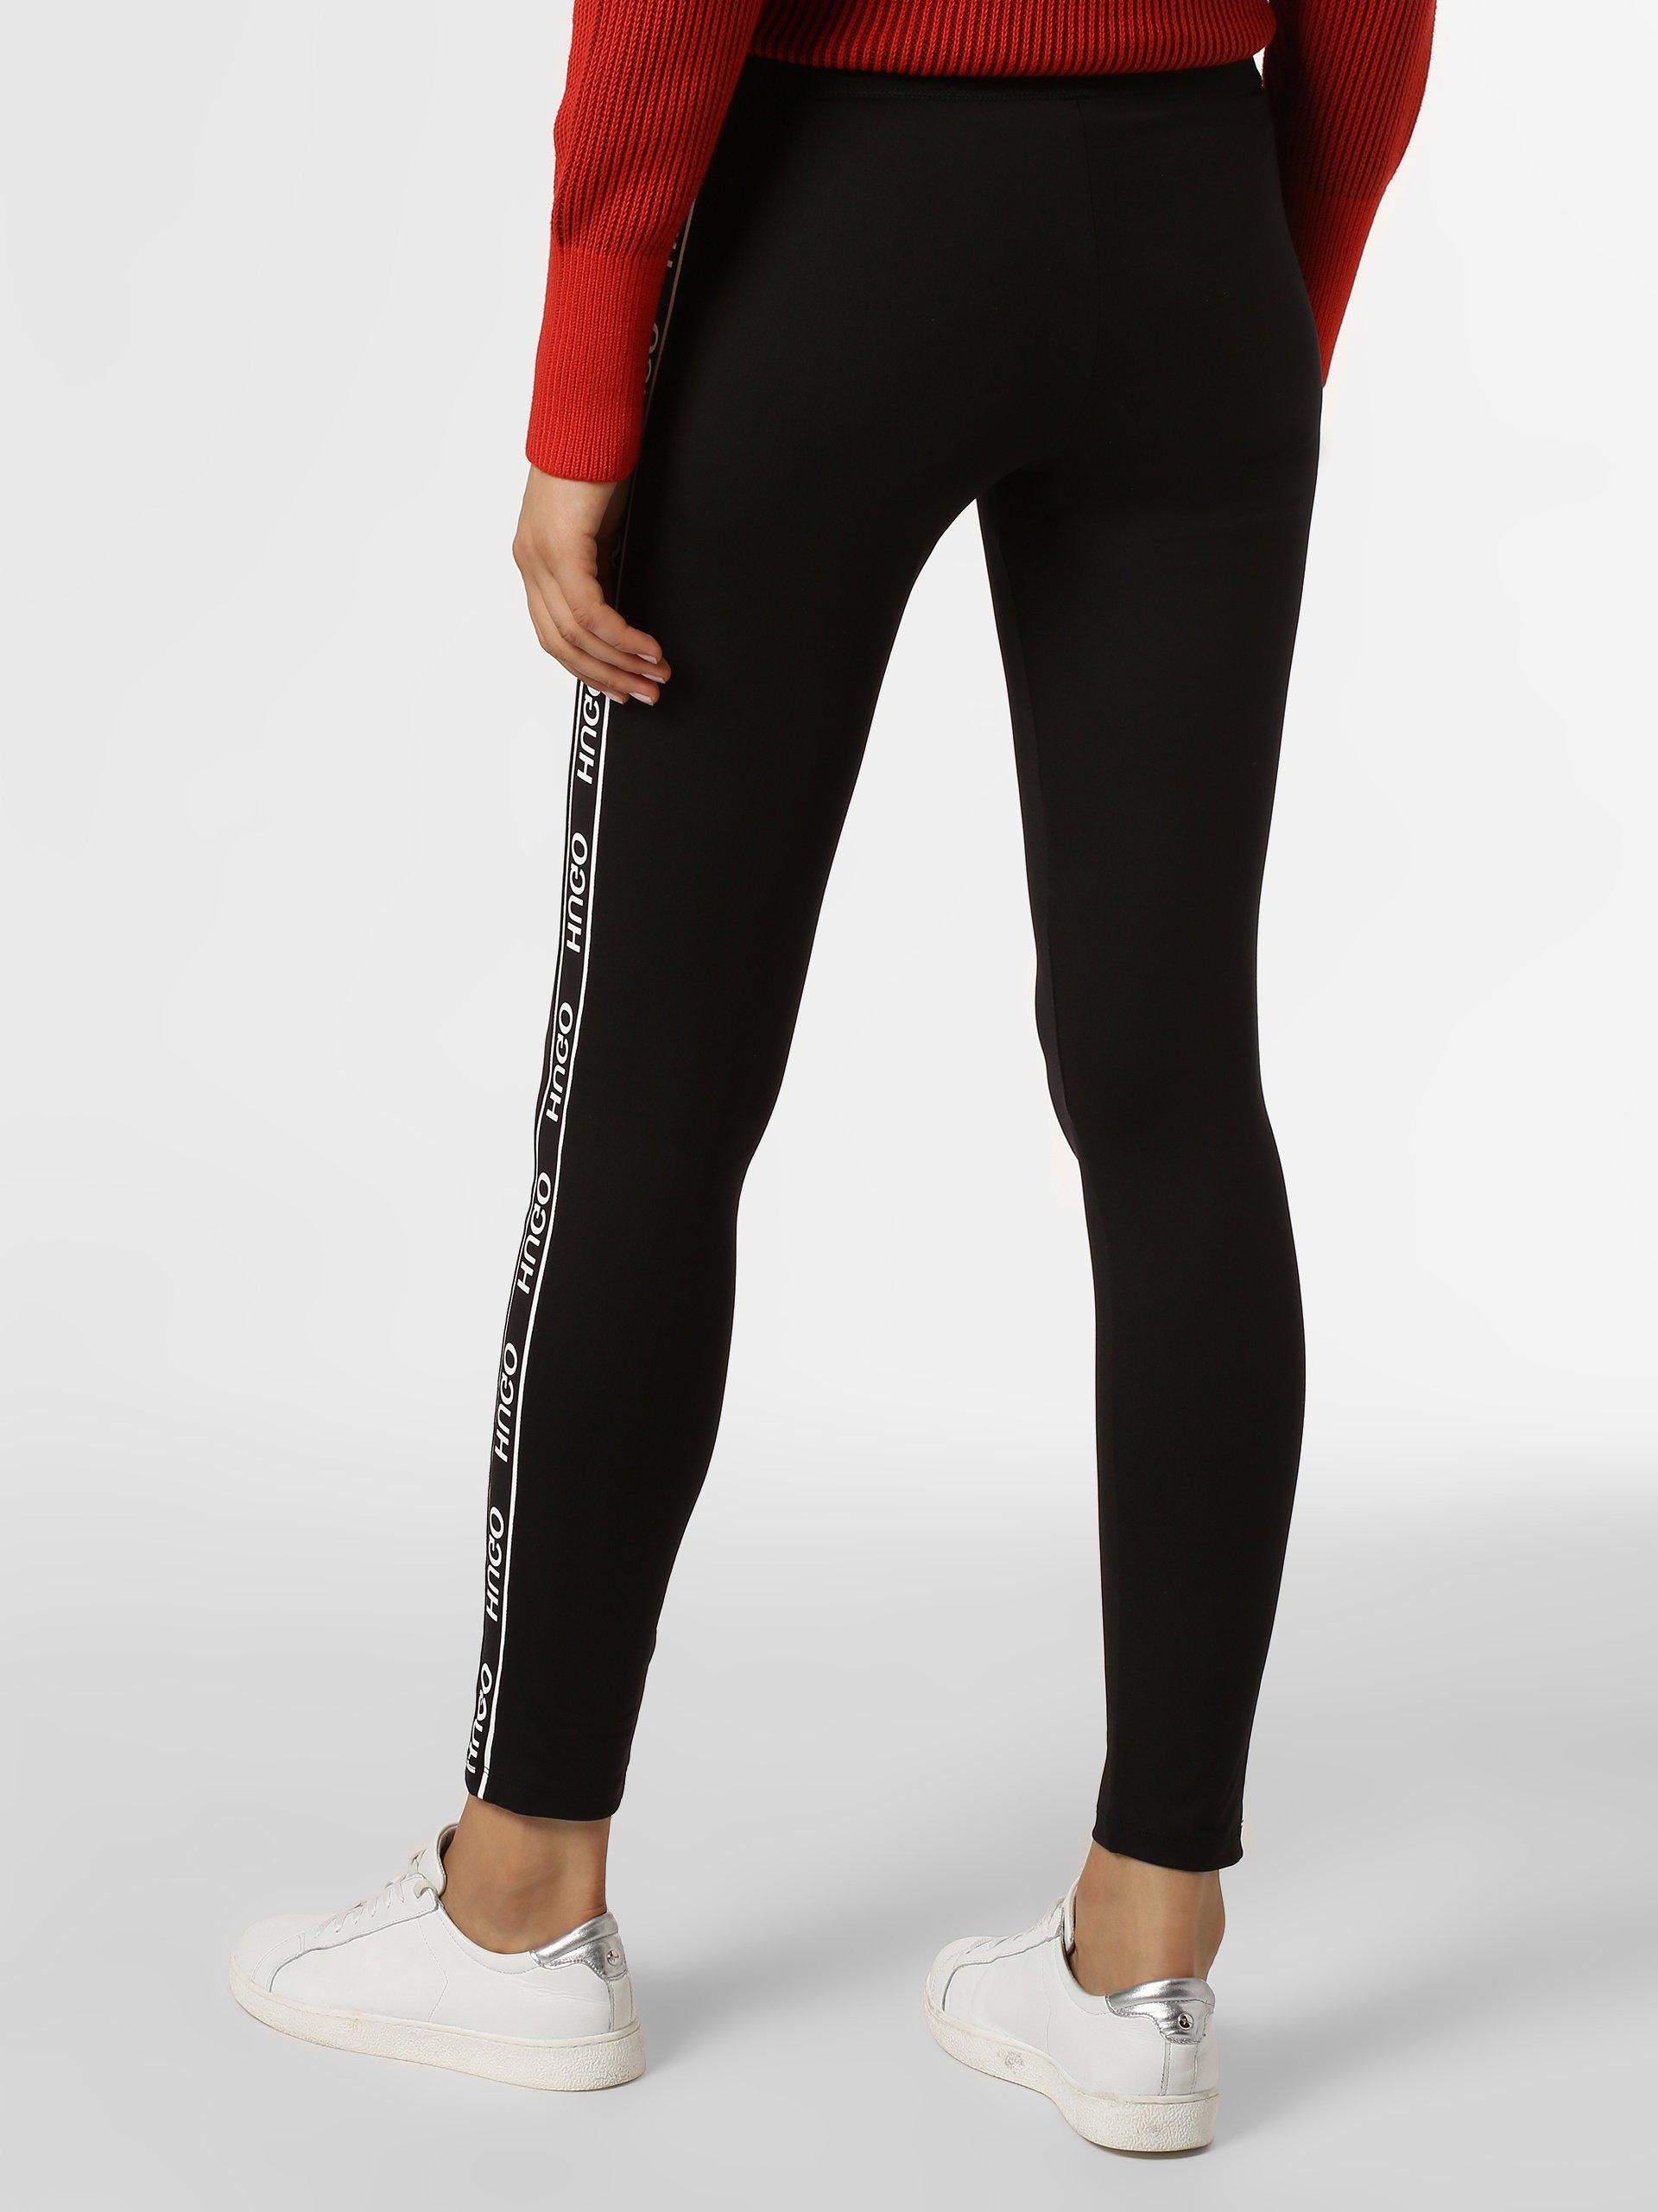 HUGO Damen Sportswear Leggings - Naky